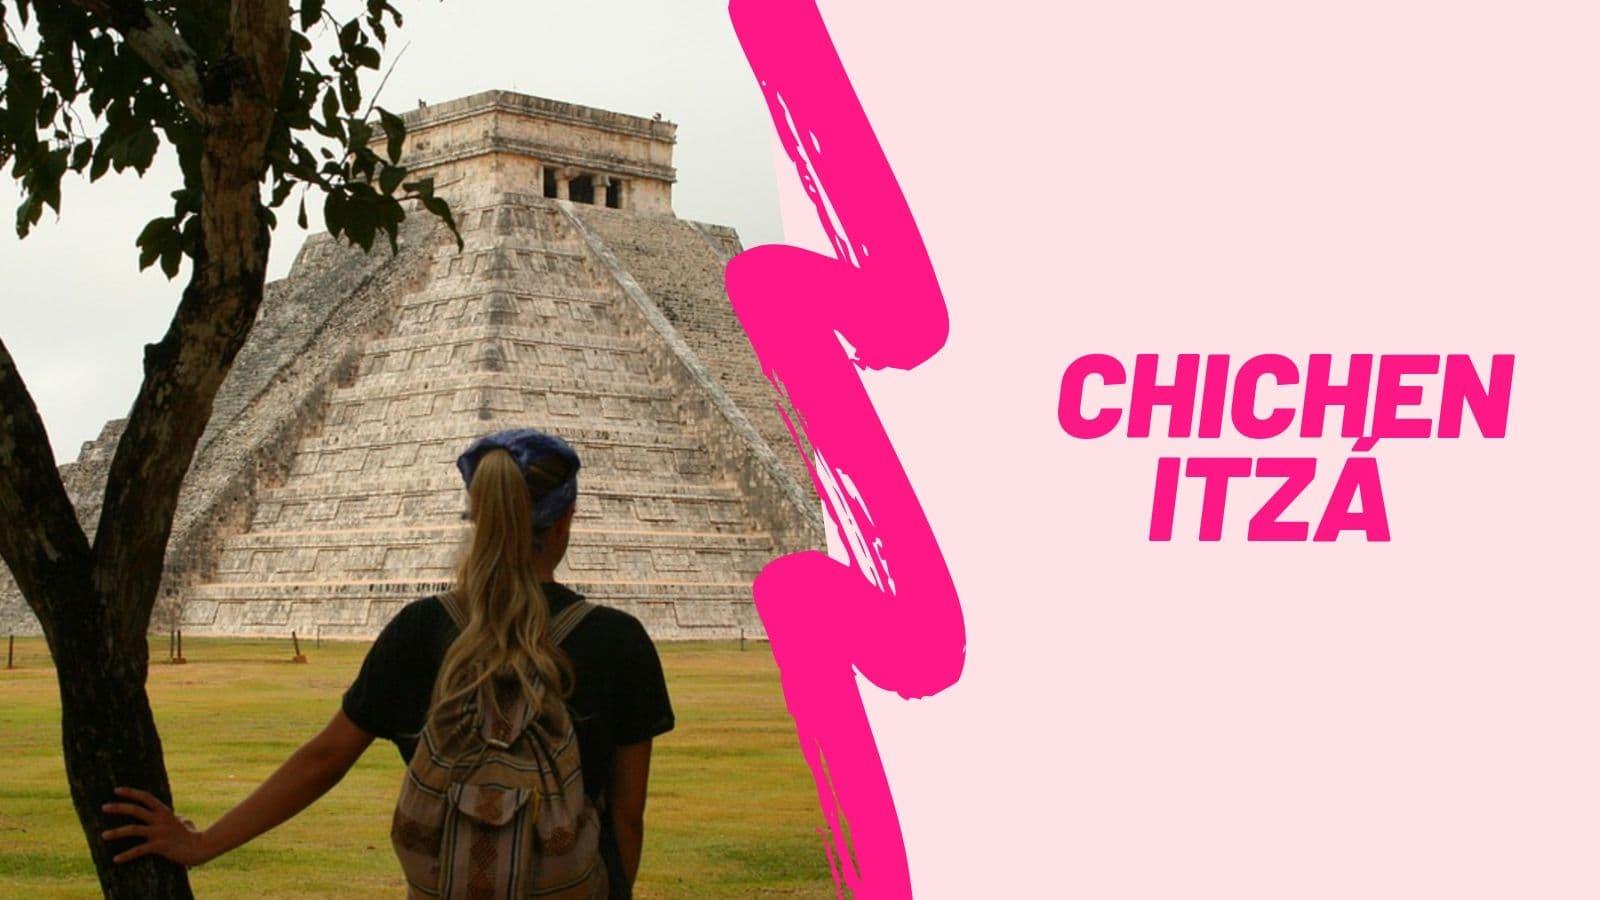 Chichen Itzá desde Playa del Carmen con cenote Ik Kil&IN